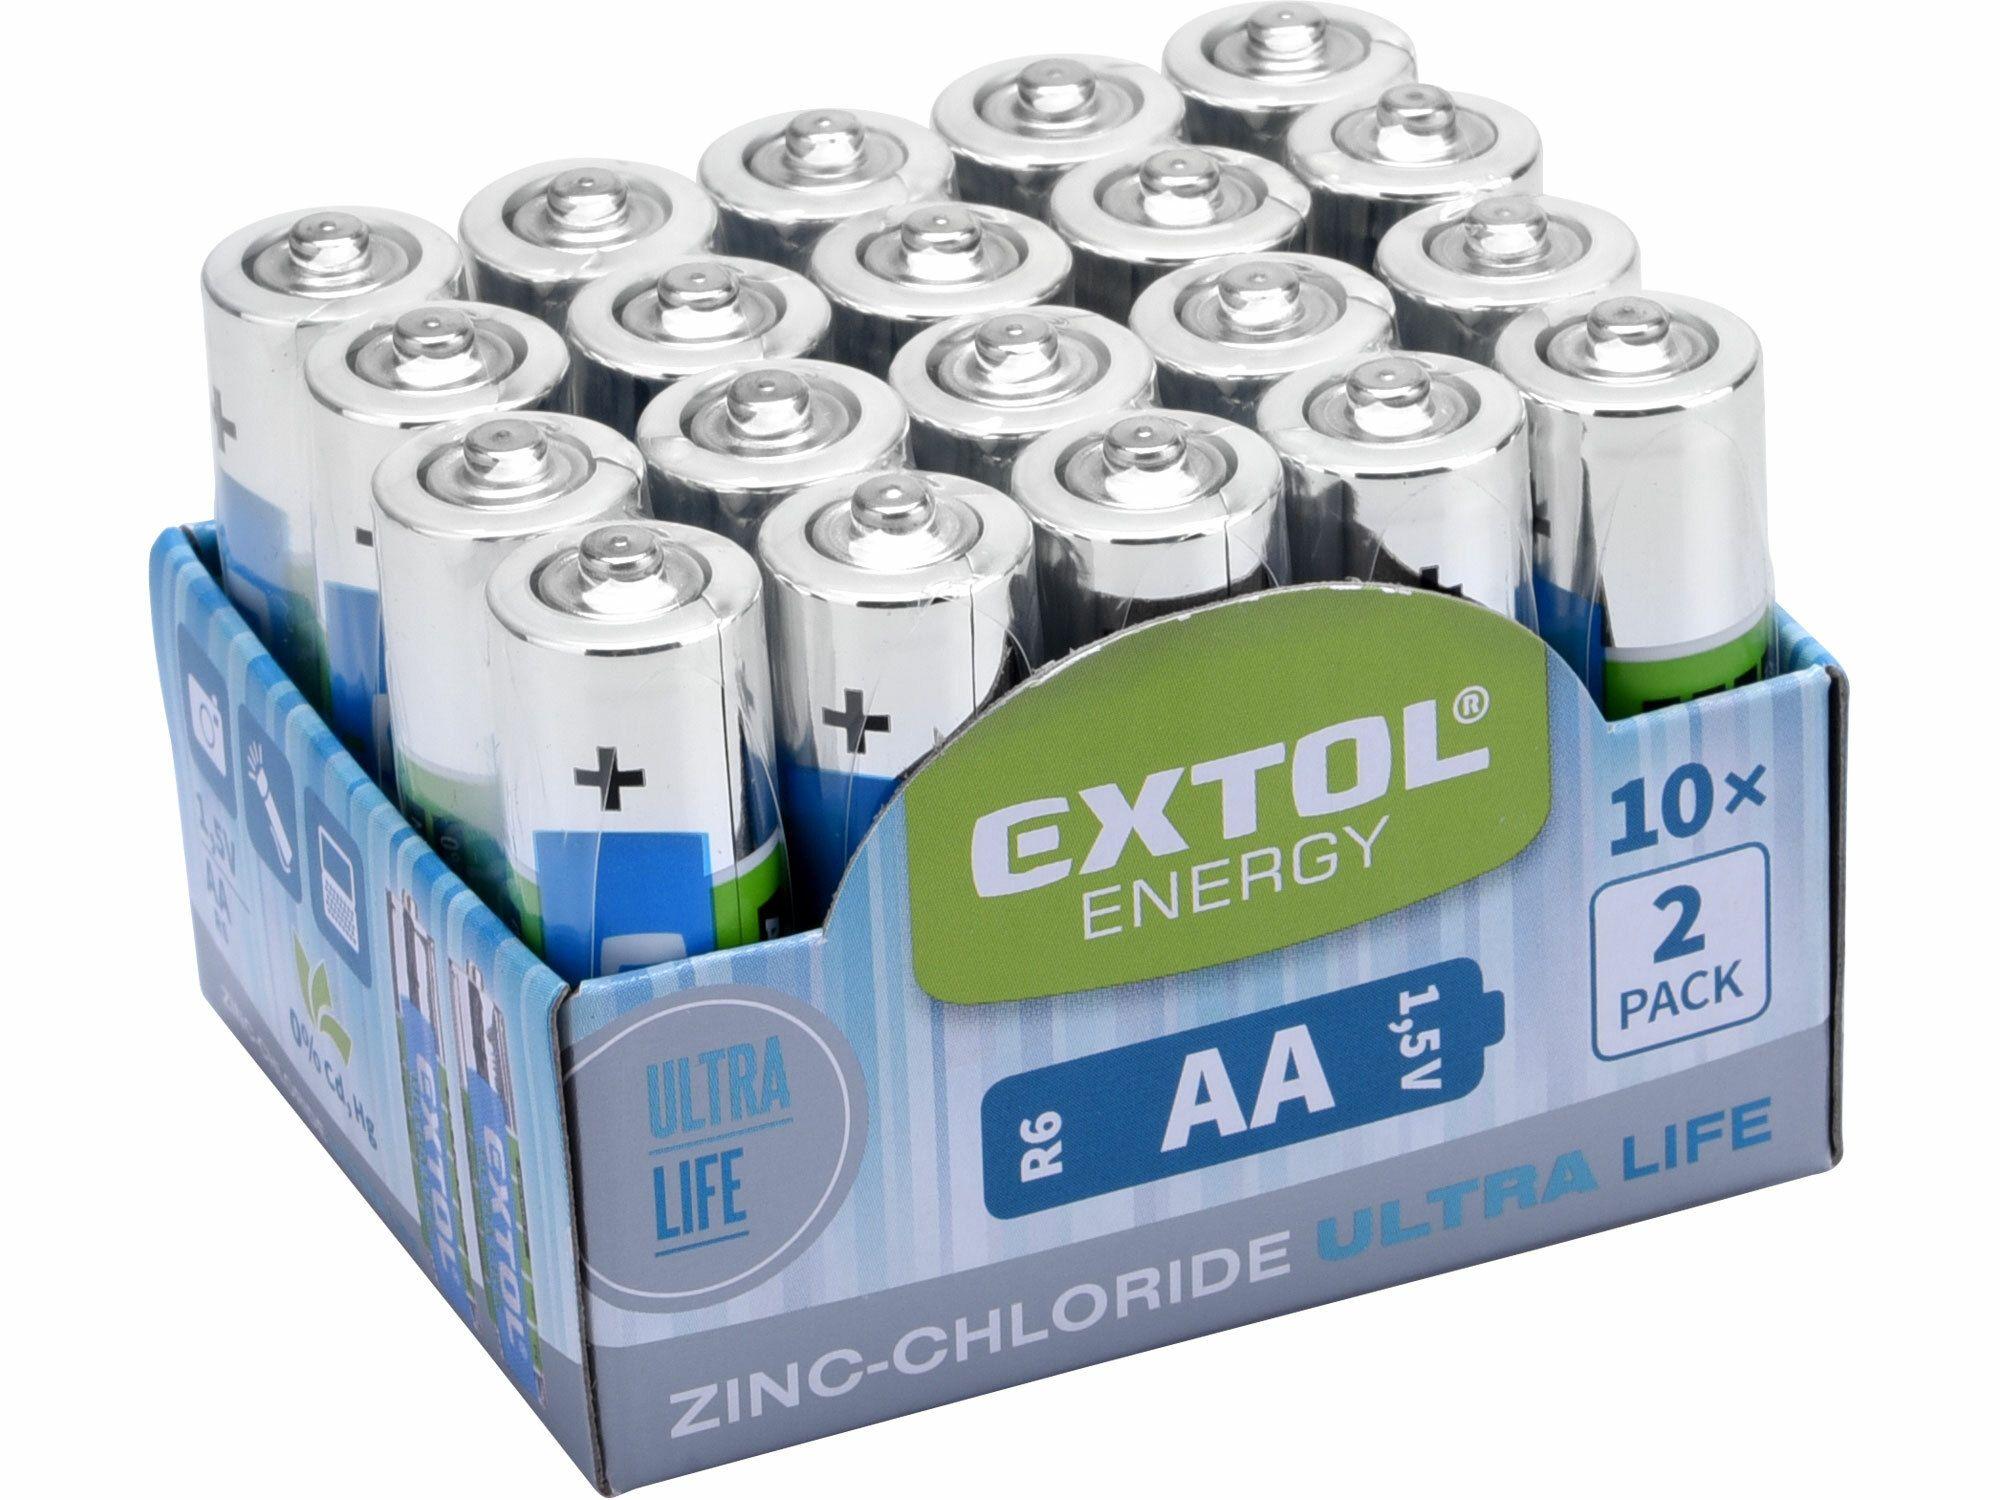 Baterie zink-chloridové, 20ks, 1,5V AA (R6), EXTOL ENERGY